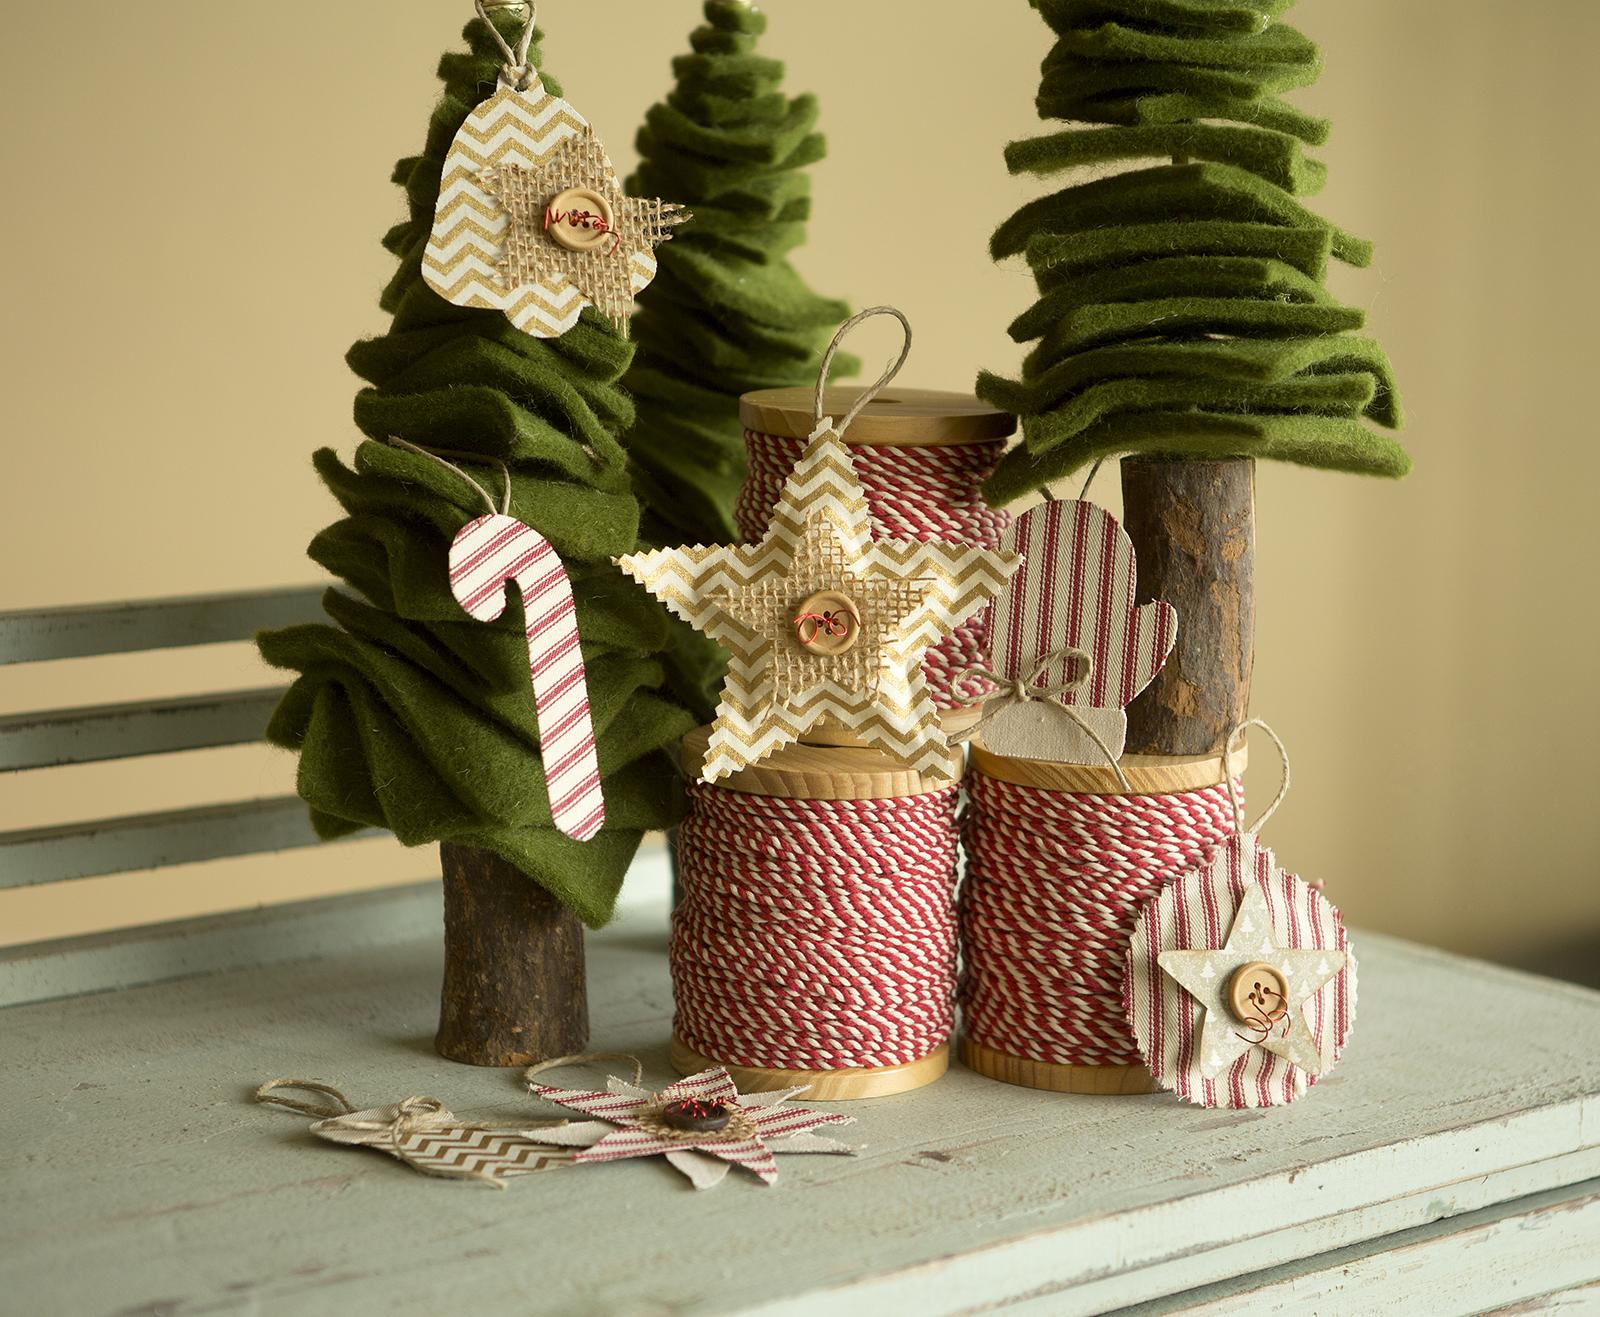 kiwi ornaments